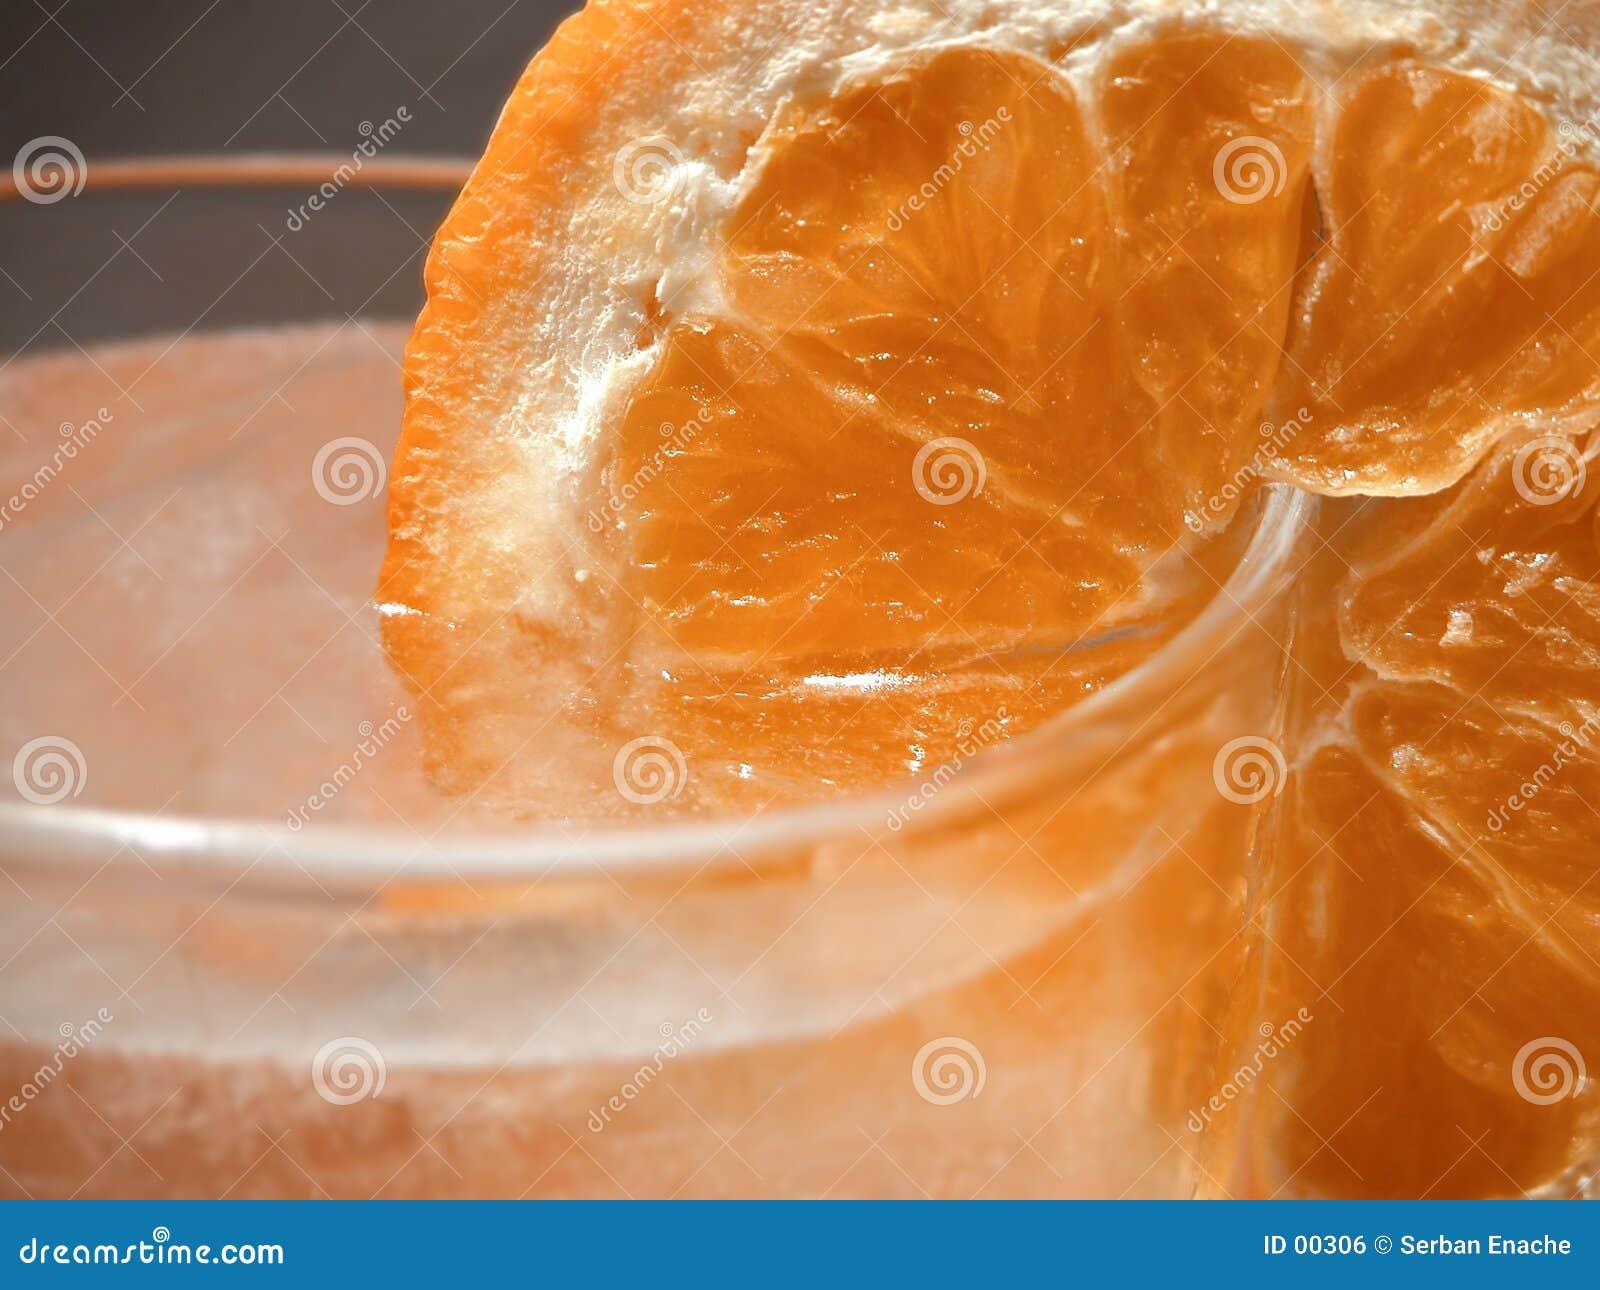 Orange slice - detail